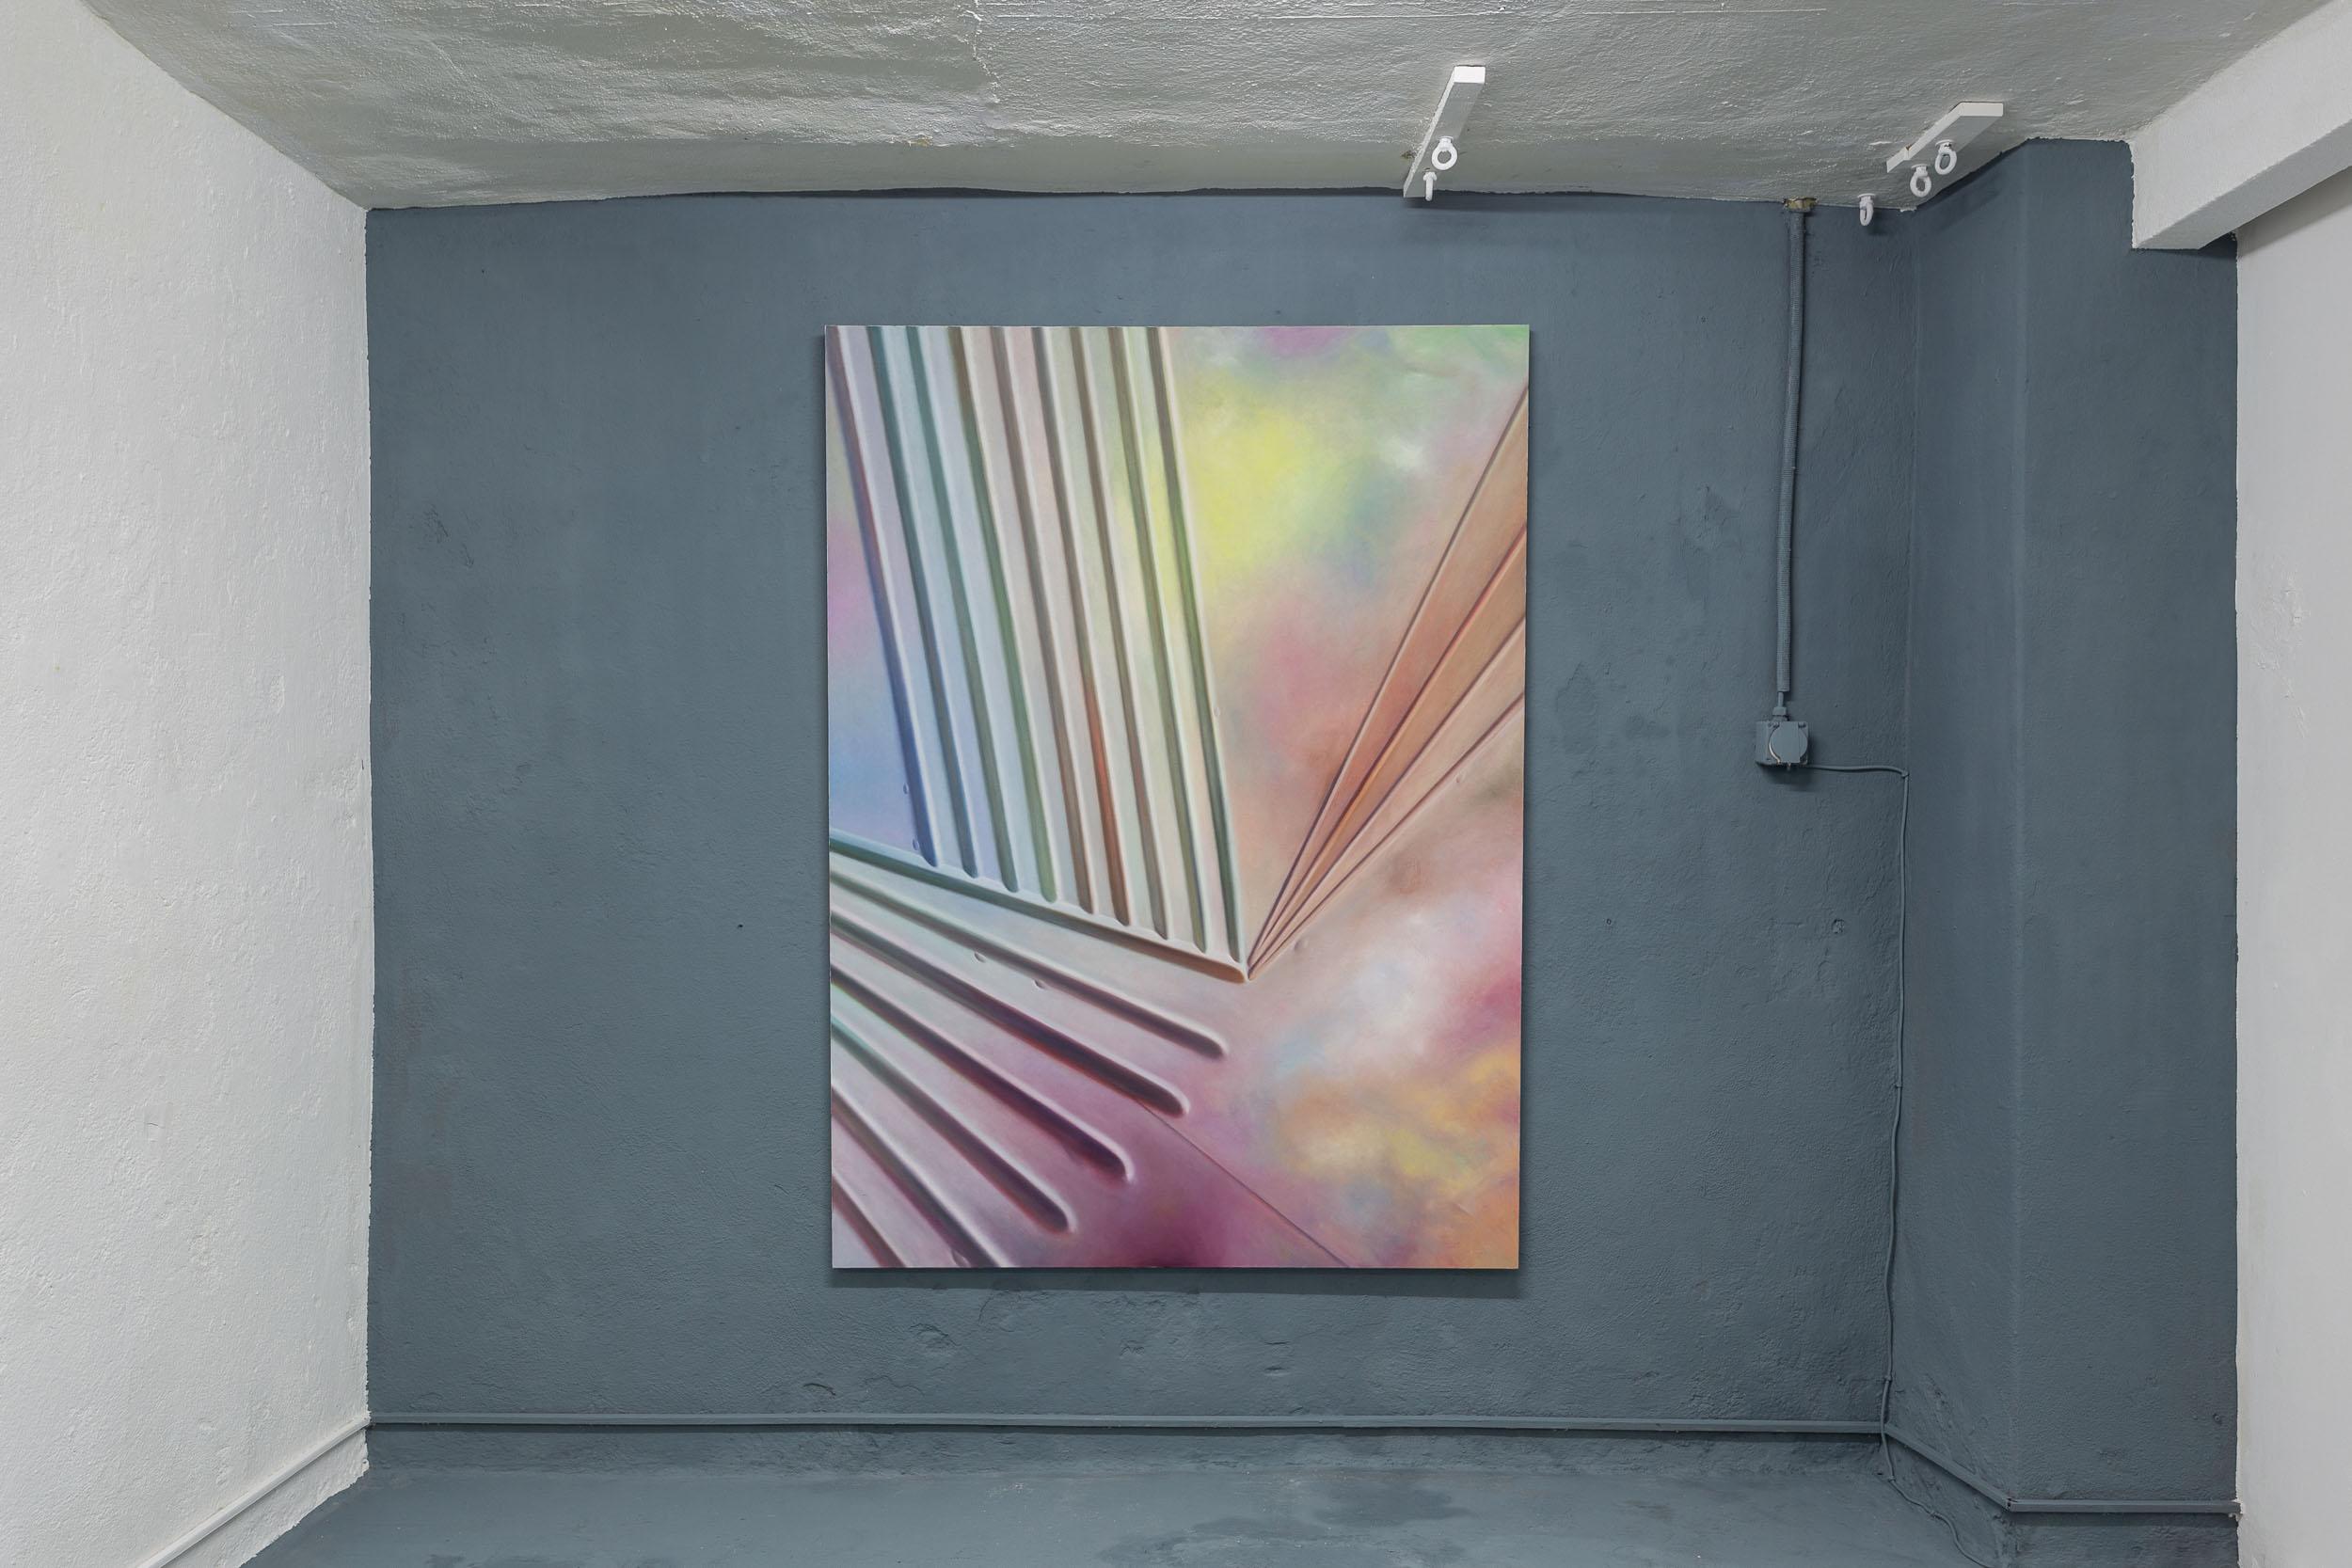 Eduardo Rubén,  Untitled  , 1994, acrylic on canvas, 109 x 149 cm  Photo: Kilian Bannwart